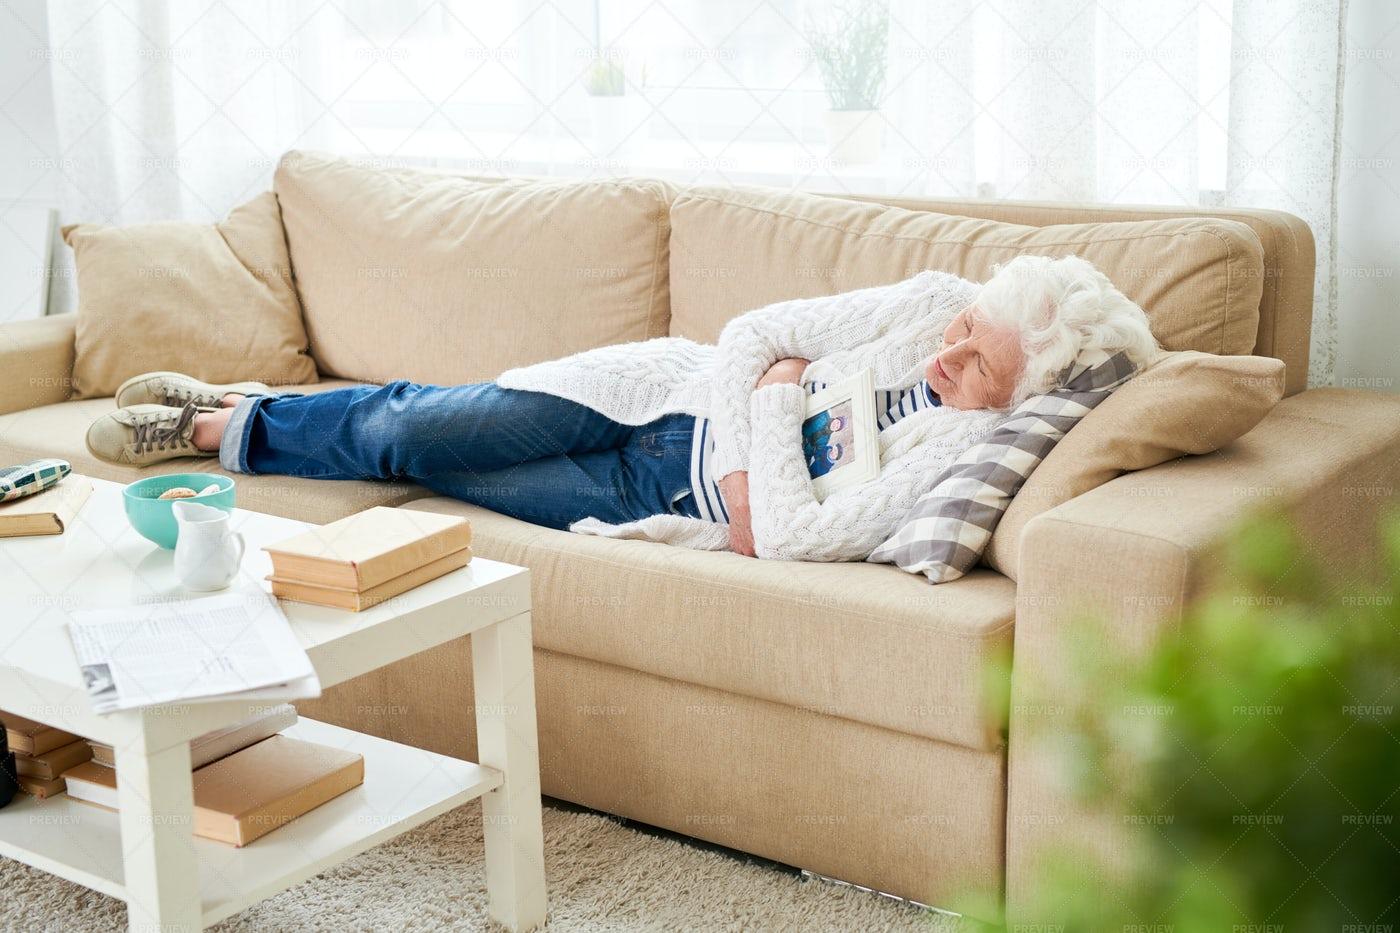 Depressed Senior Woman Remembering...: Stock Photos